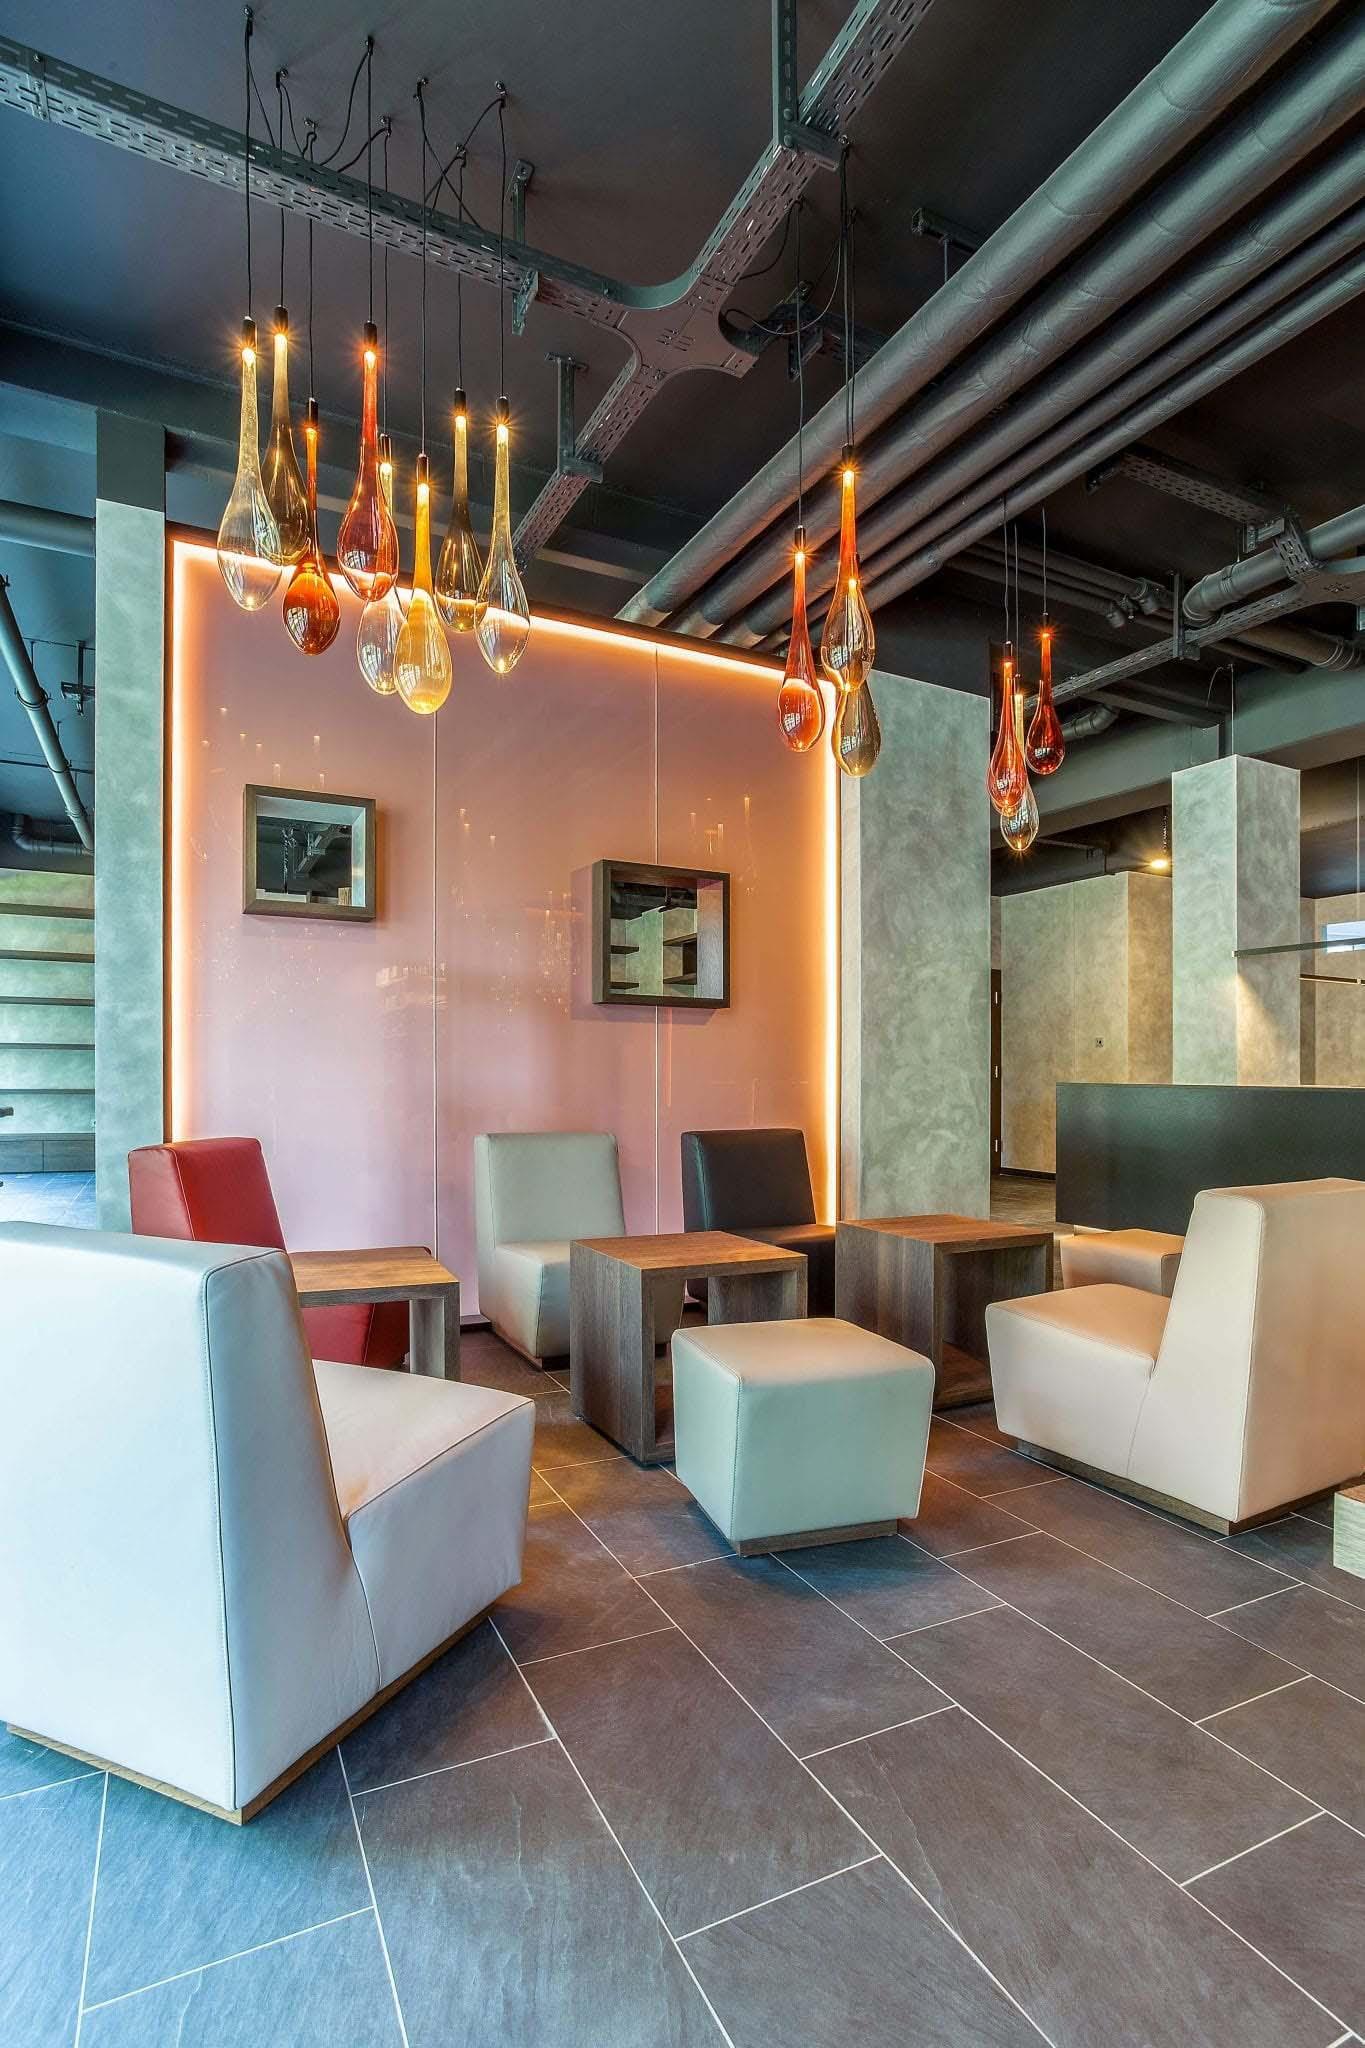 2016 05 19 Chateau 9 Feinkost+café (24) Min